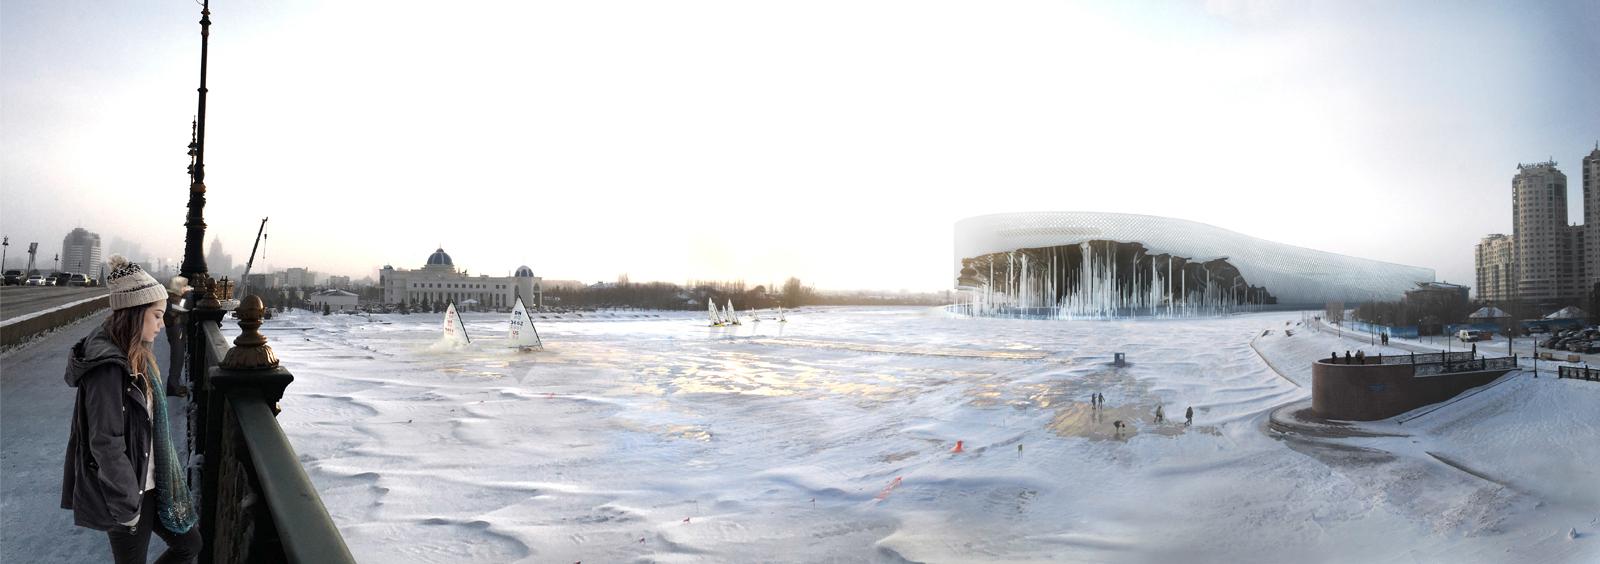 MJZ_Kazakhstan-Memorial-46